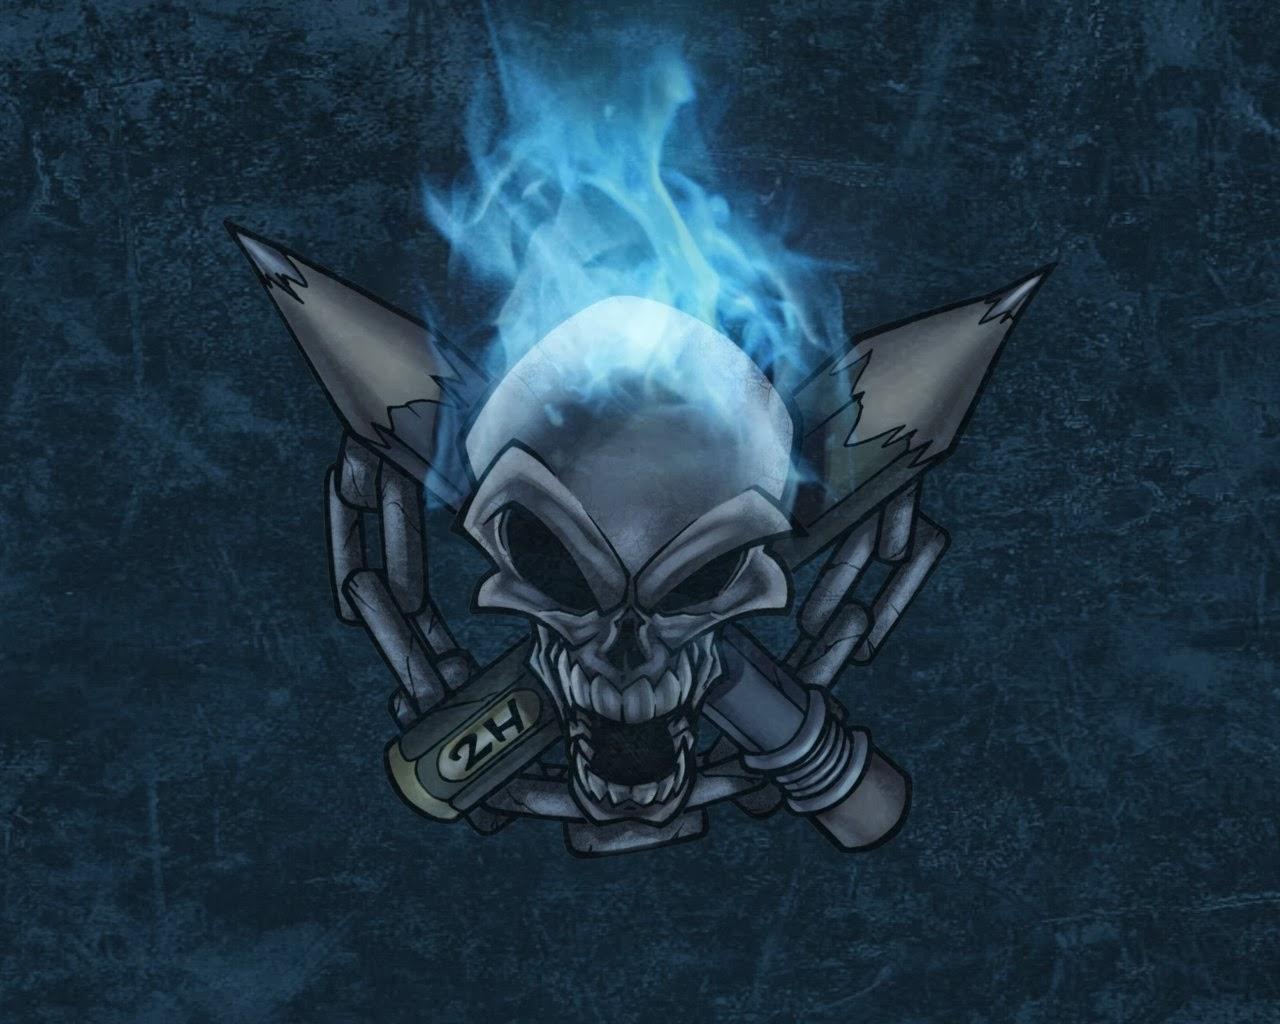 Fantastic   Wallpaper Home Screen Skull - blue+skull+photos++5  You Should Have_742989.jpg